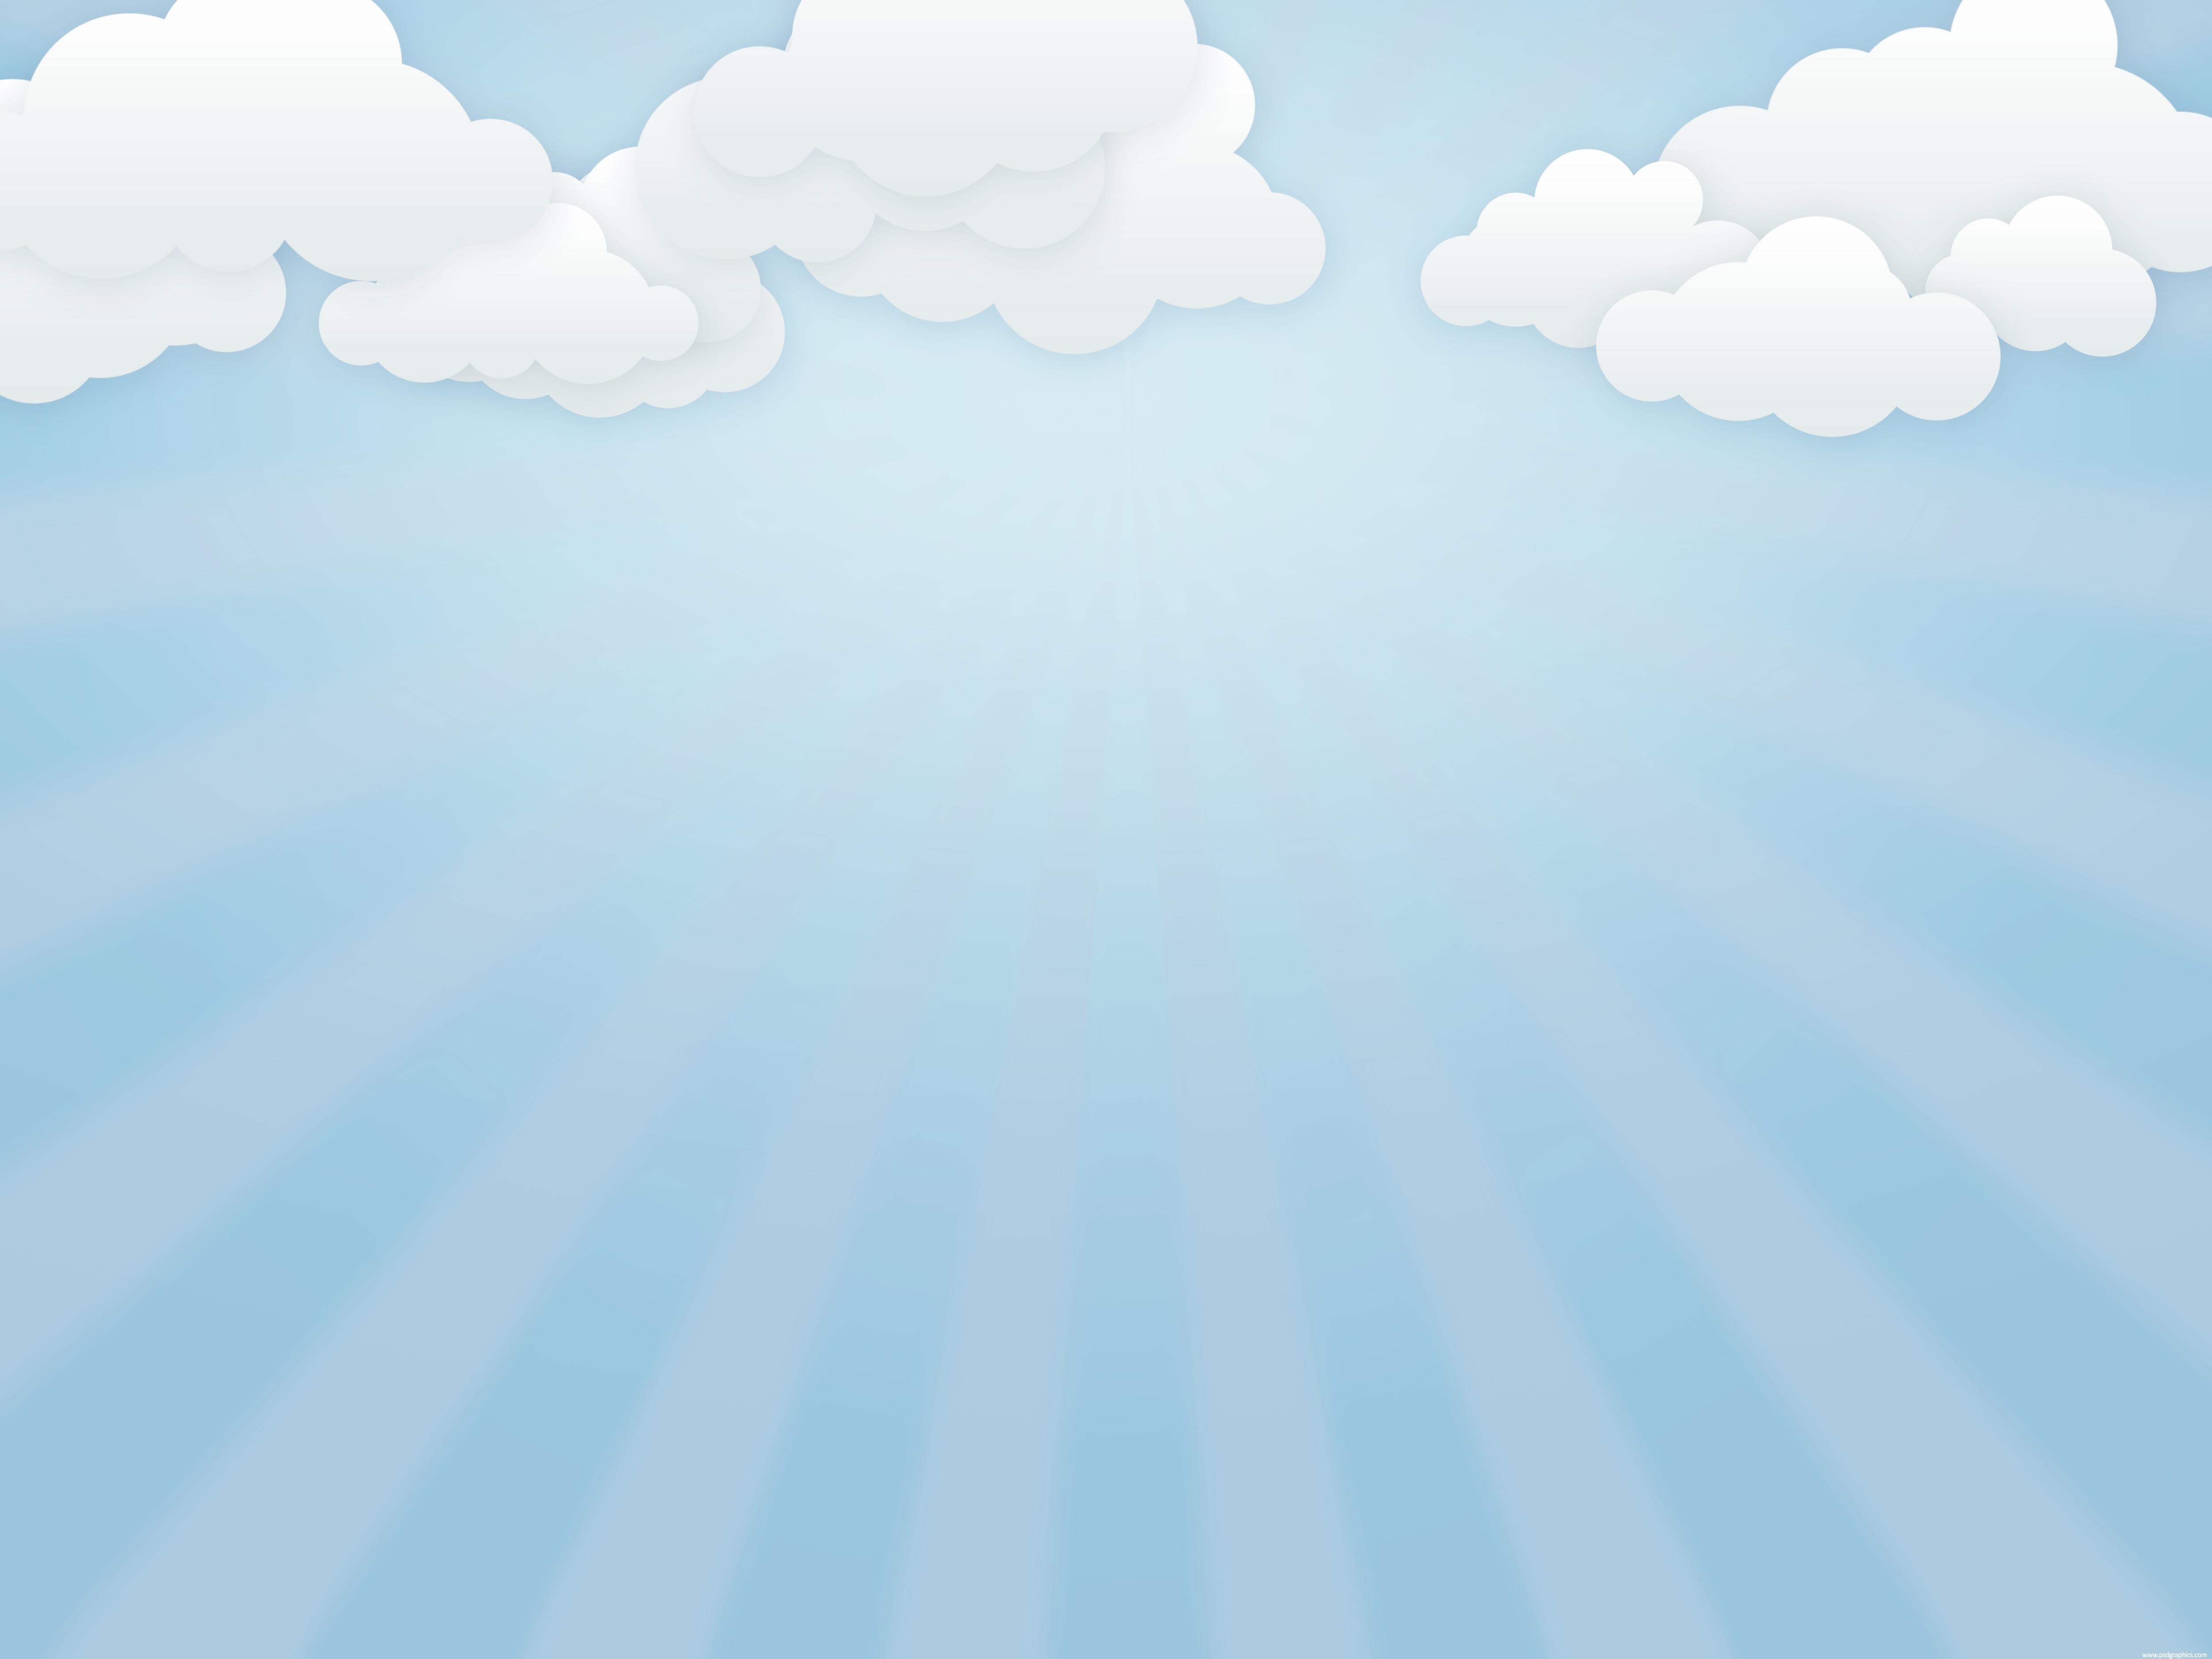 Free cloudy sky.